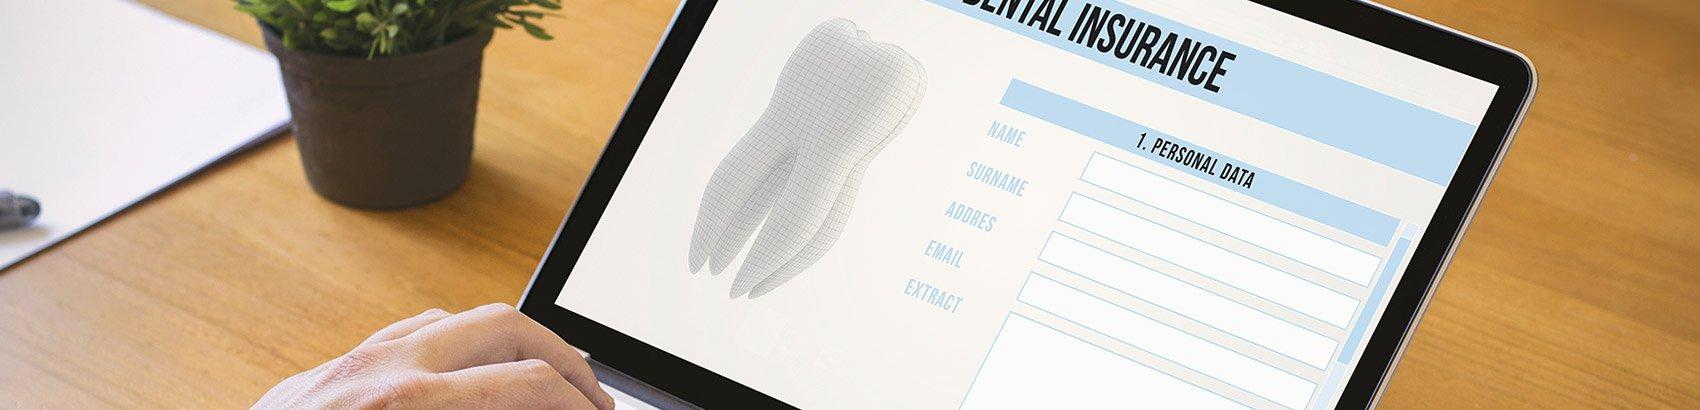 Payment and Insurance - Asuncion Dental Group